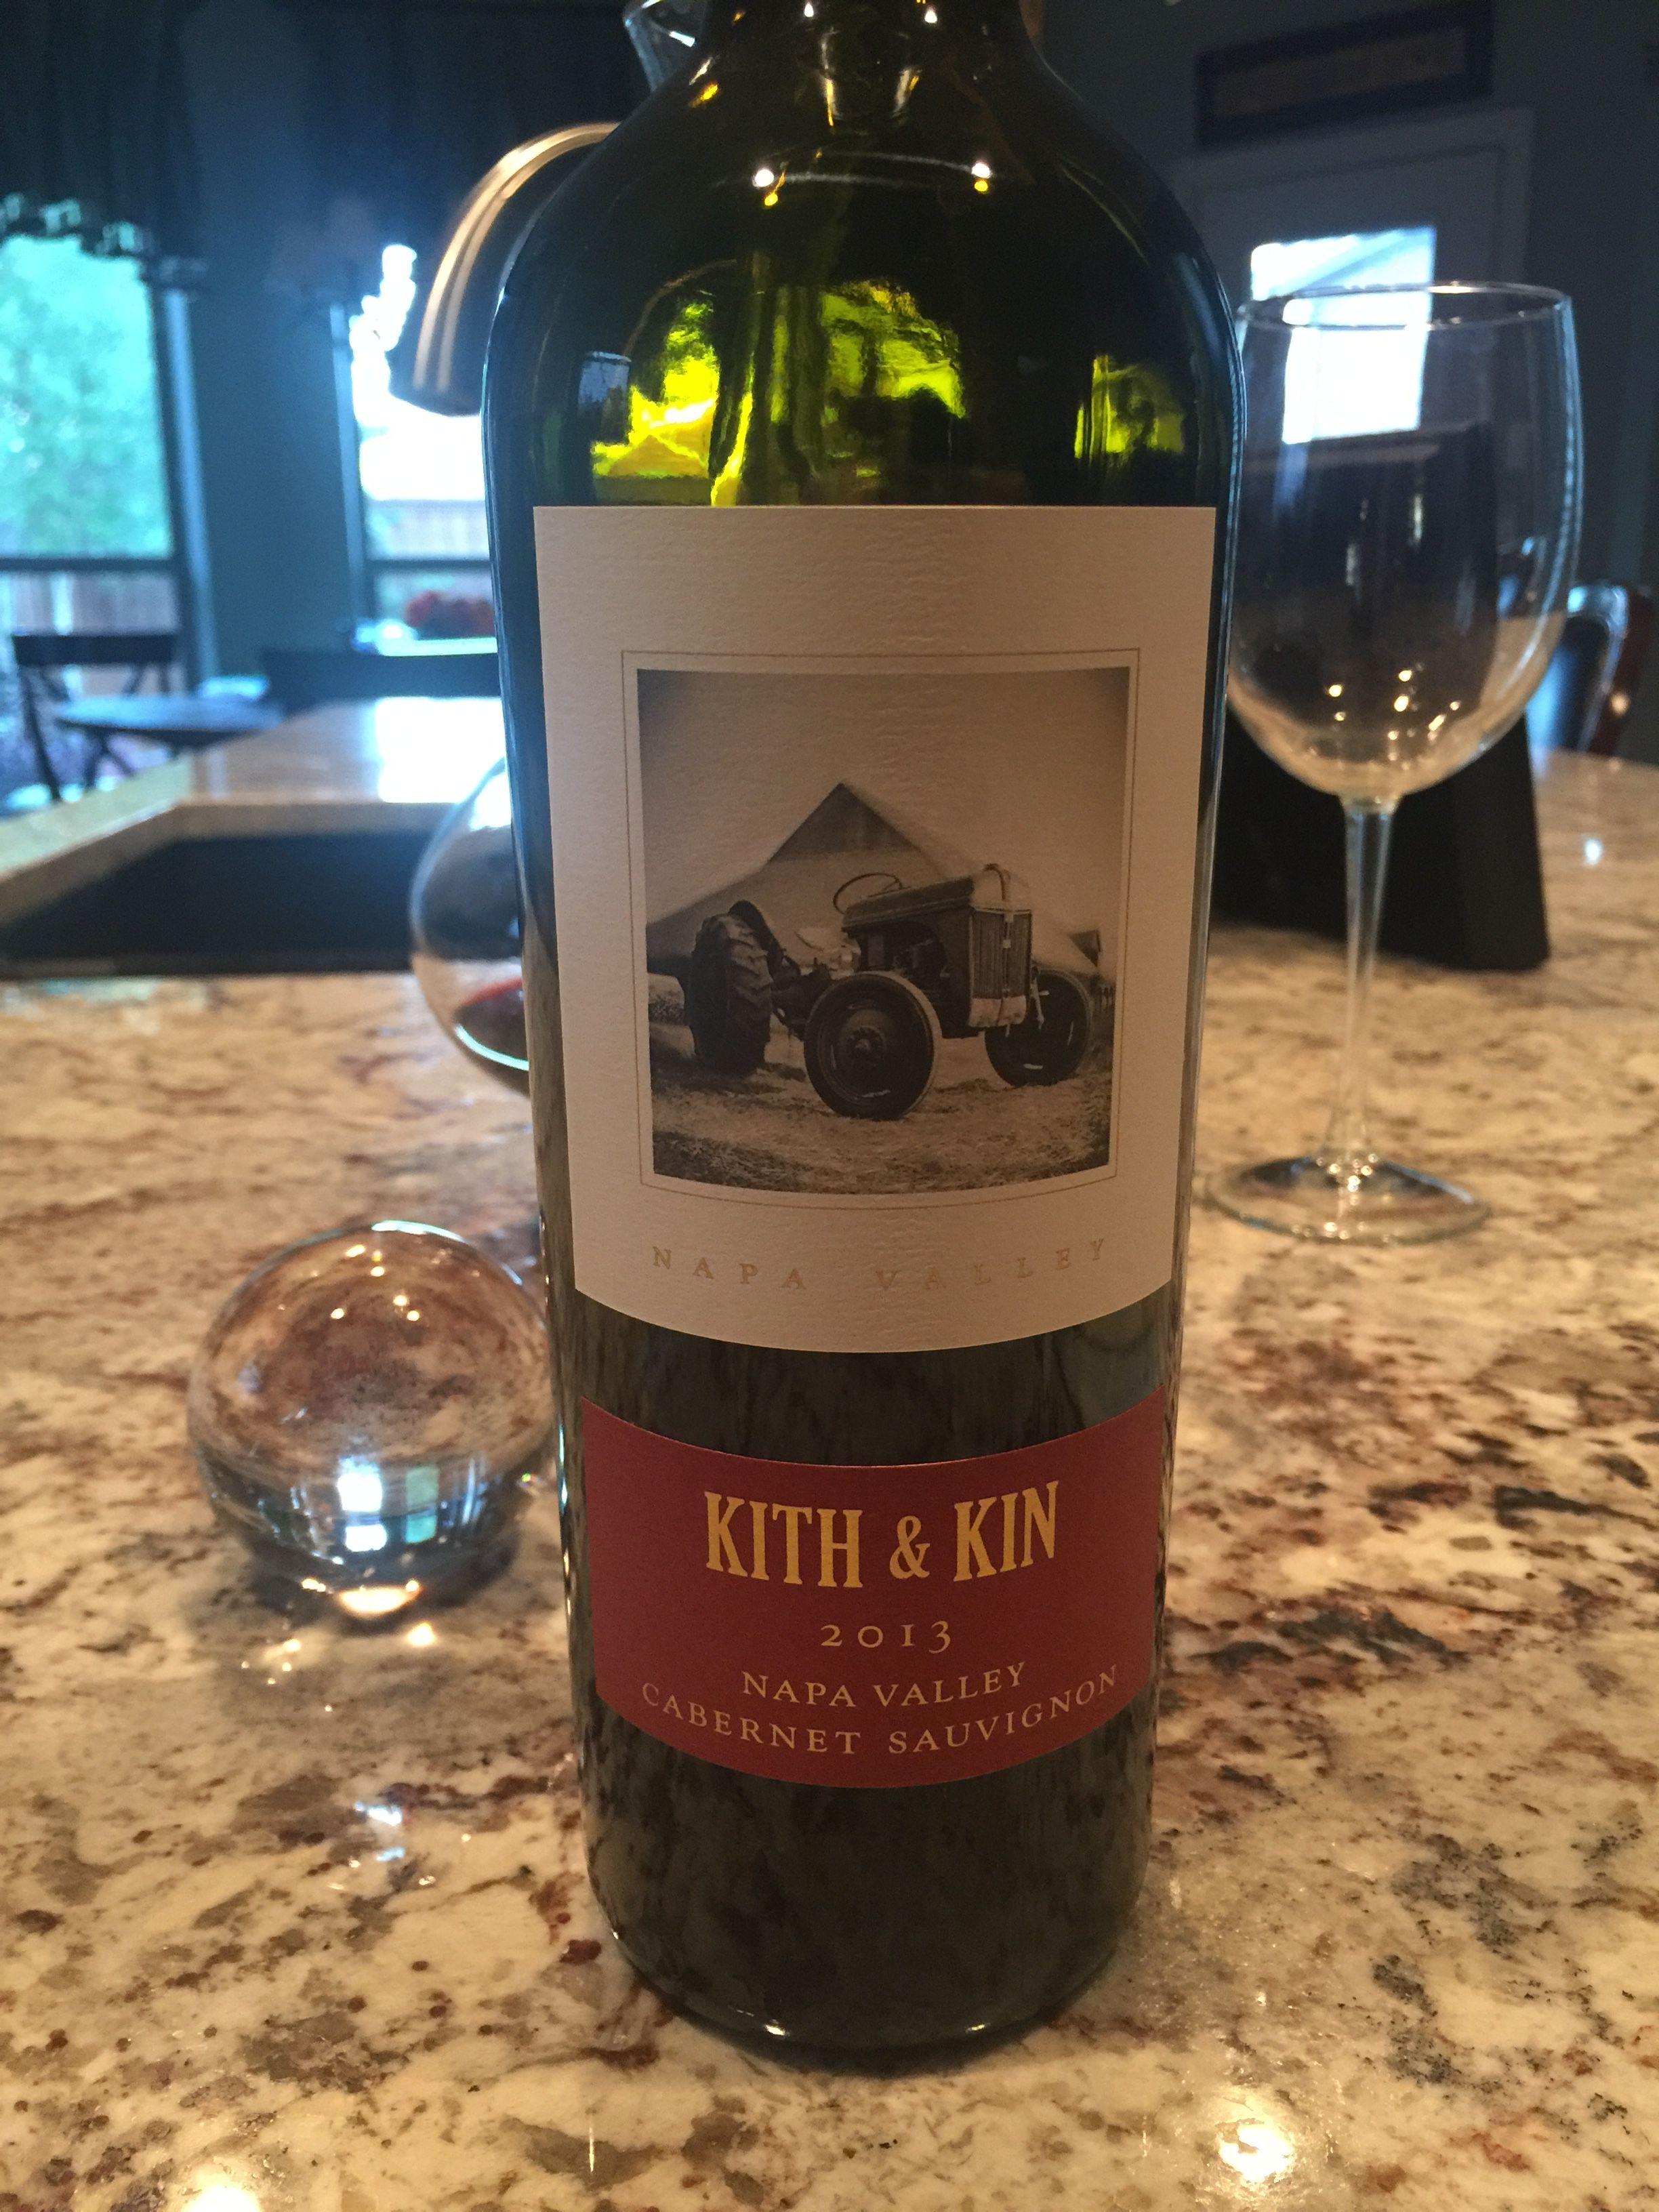 Kith & Kin 2013 Napa Valley Cabernet Sauvignon | All about wine